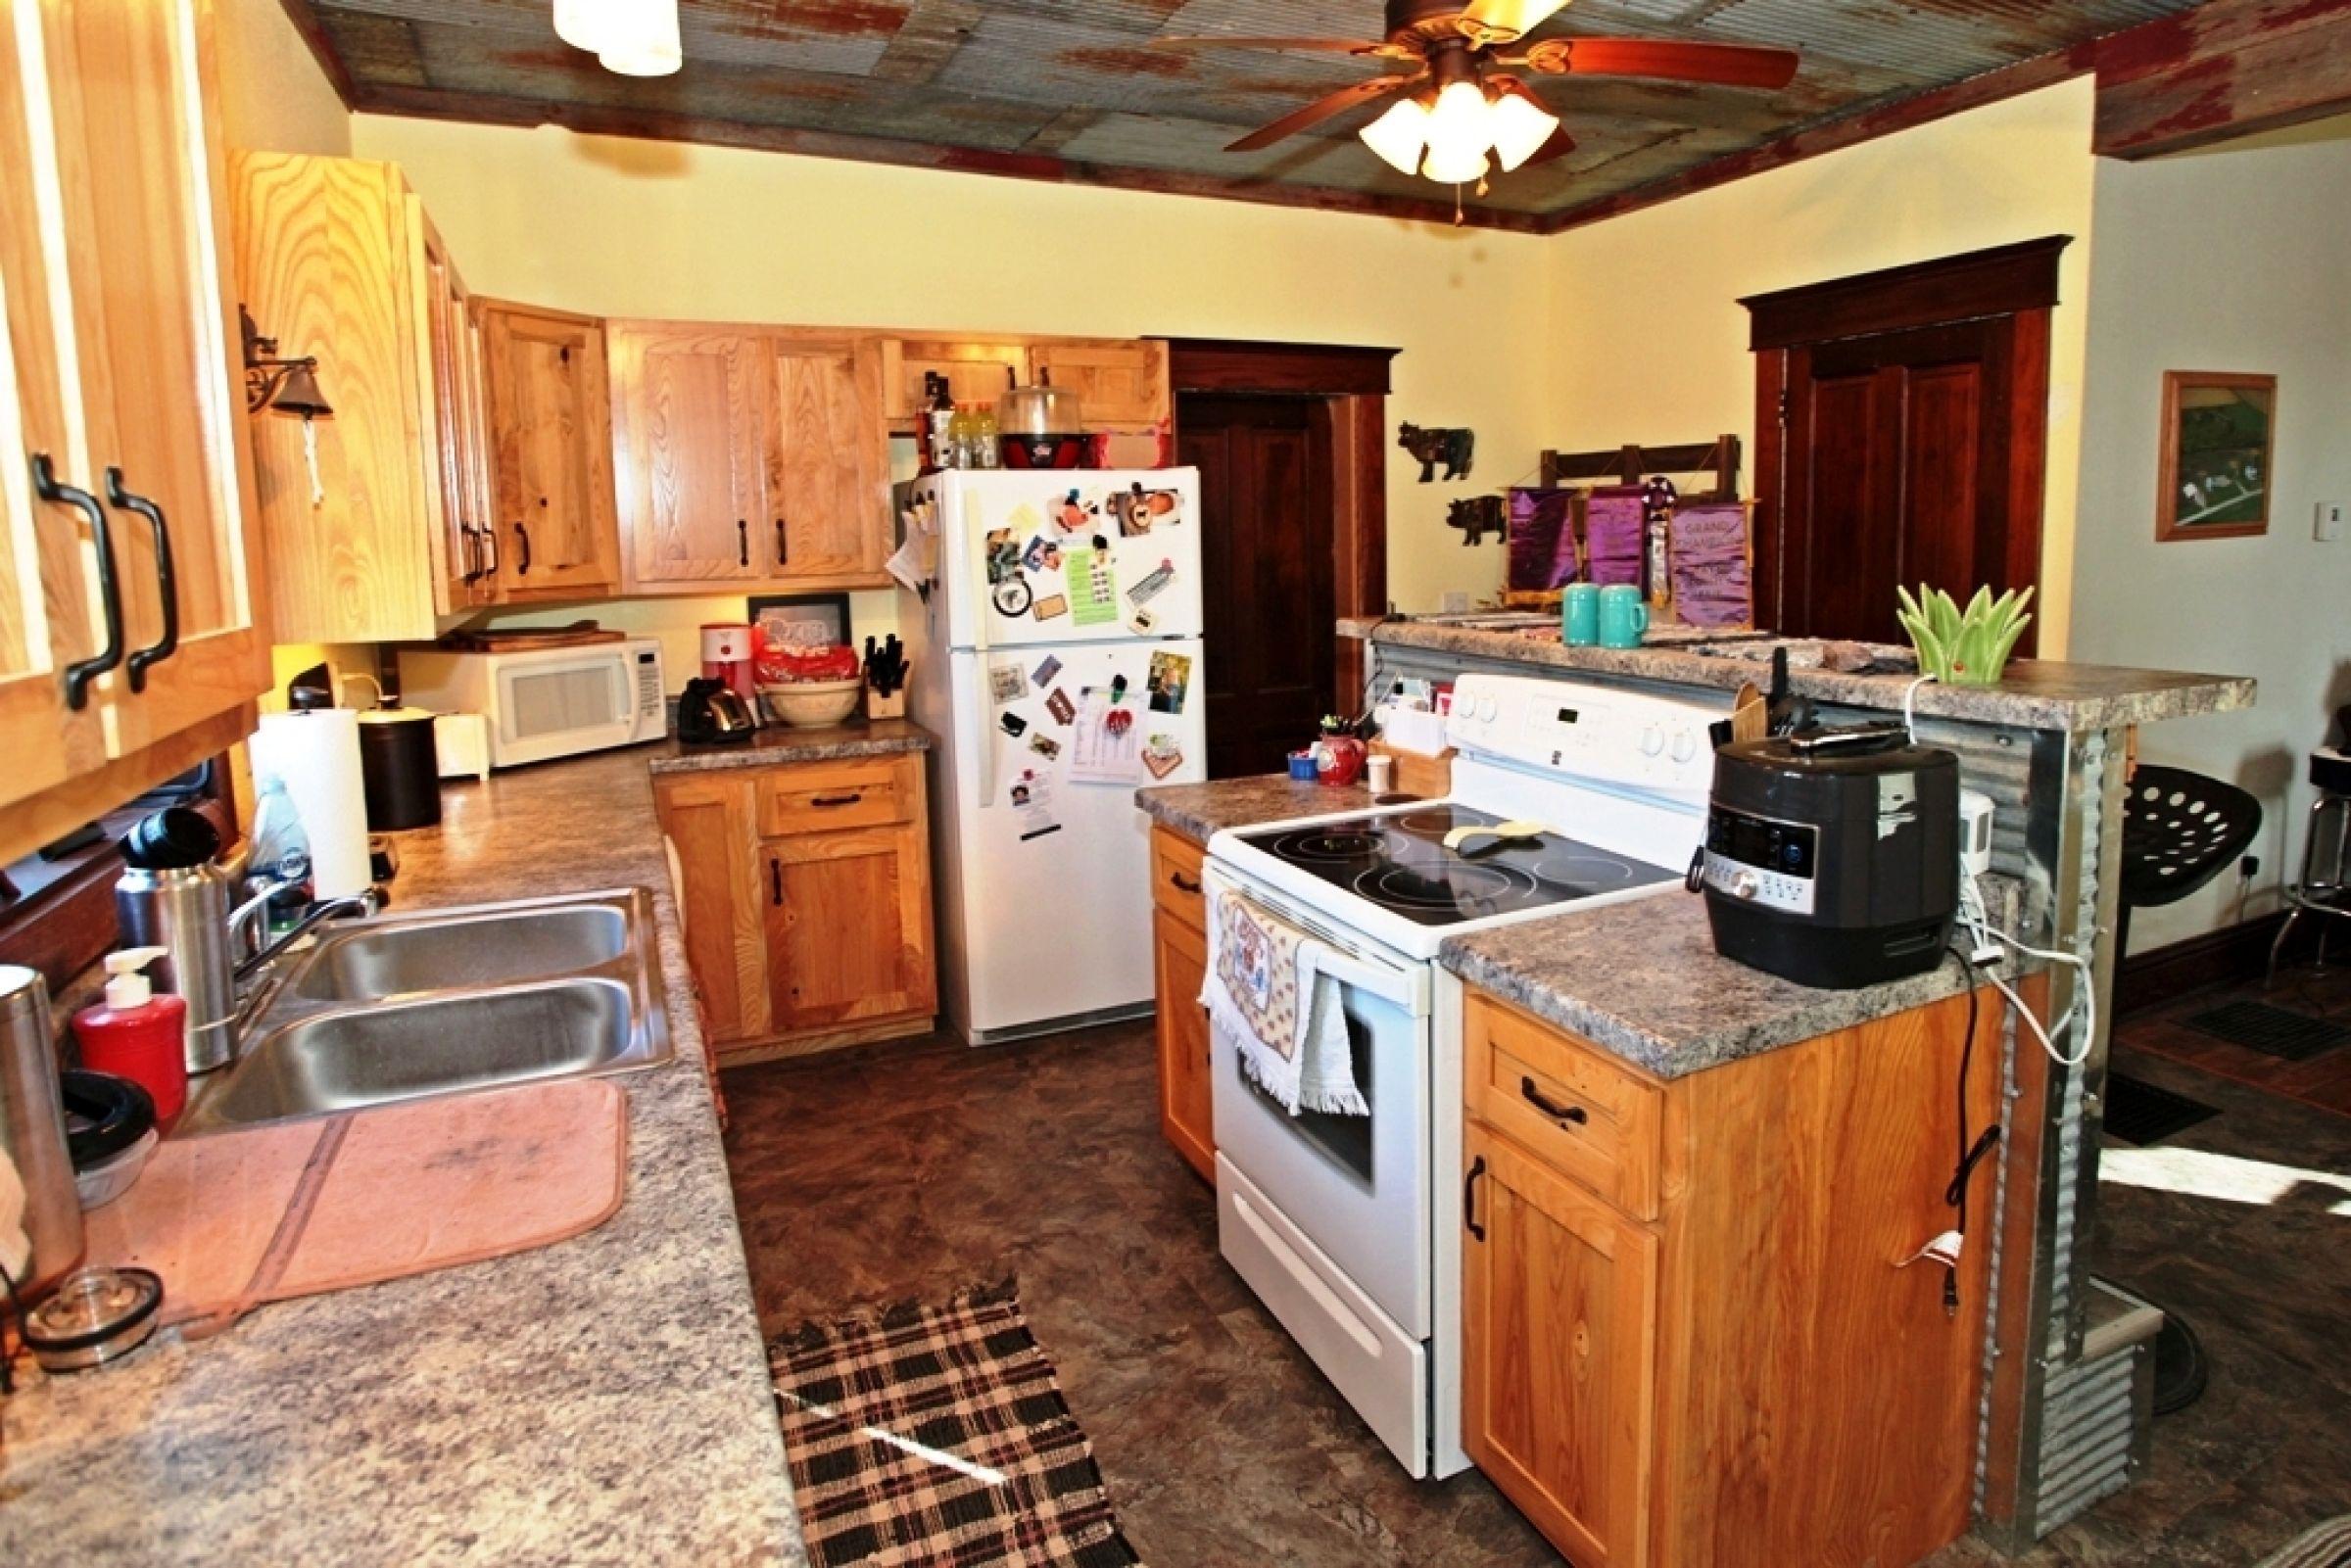 residential-wayne-county-iowa-1-acres-listing-number-15243-0-2020-11-05-200326.JPG